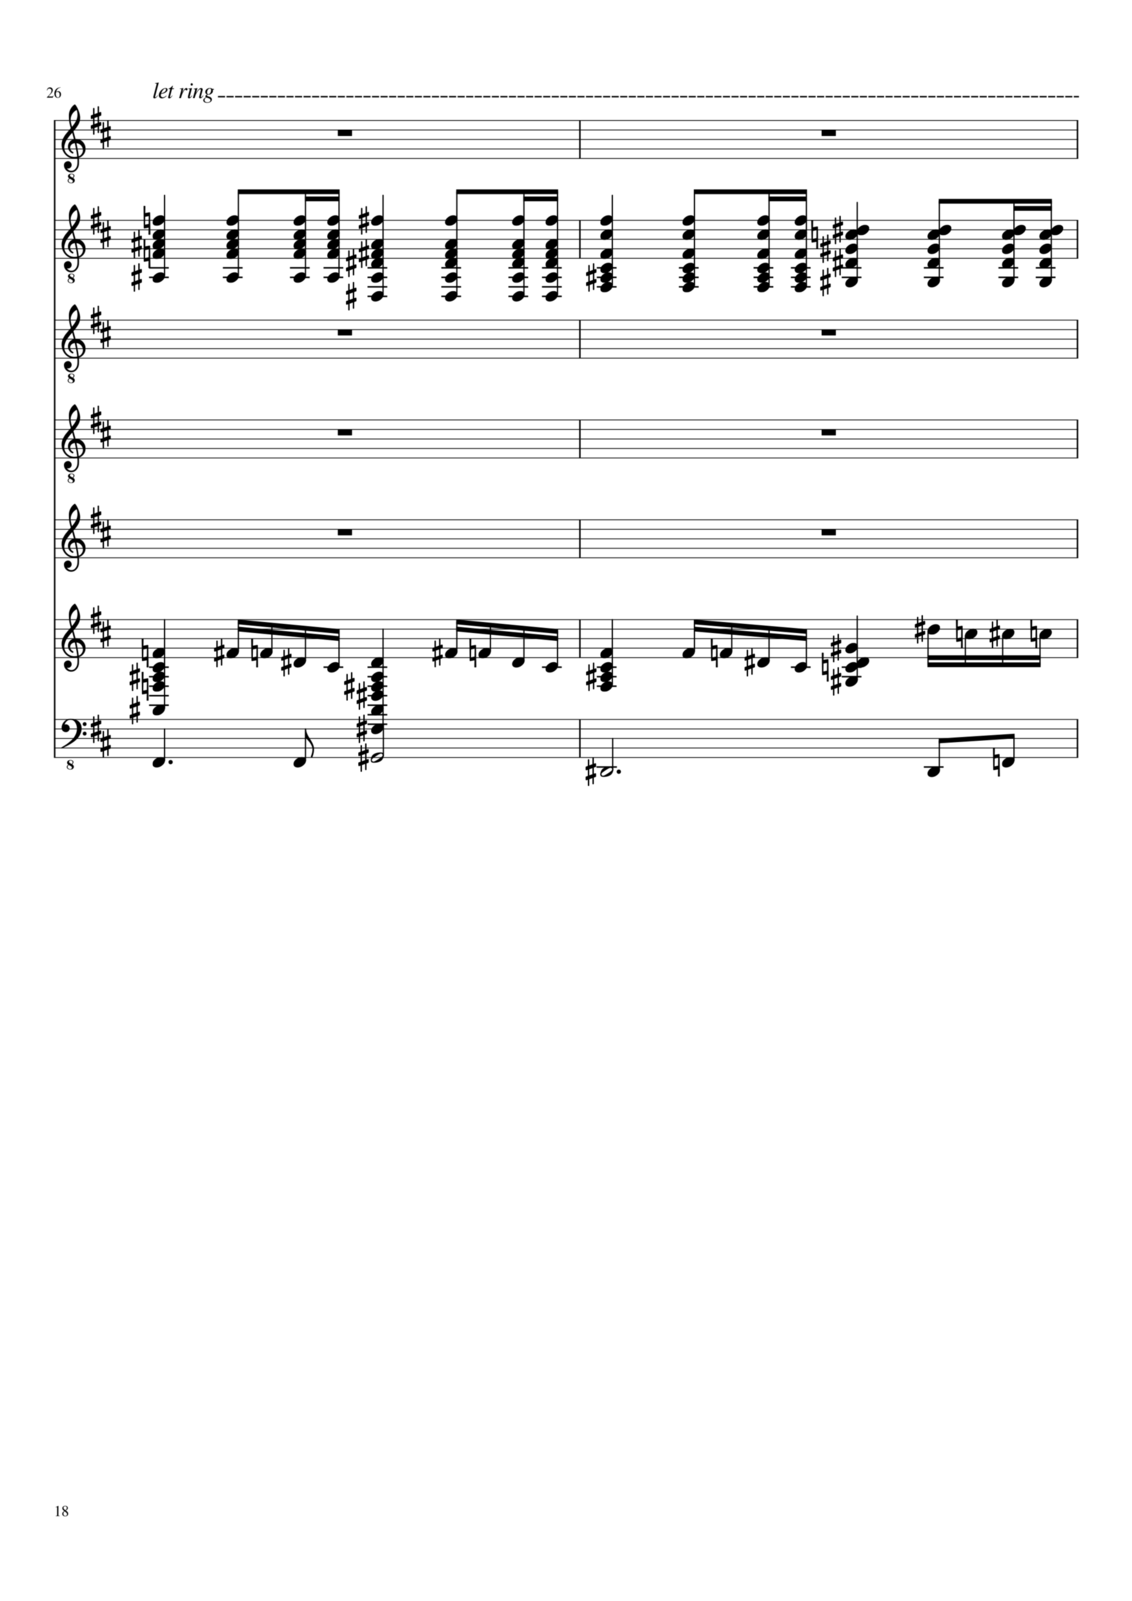 Romans o sleze slide, Image 18